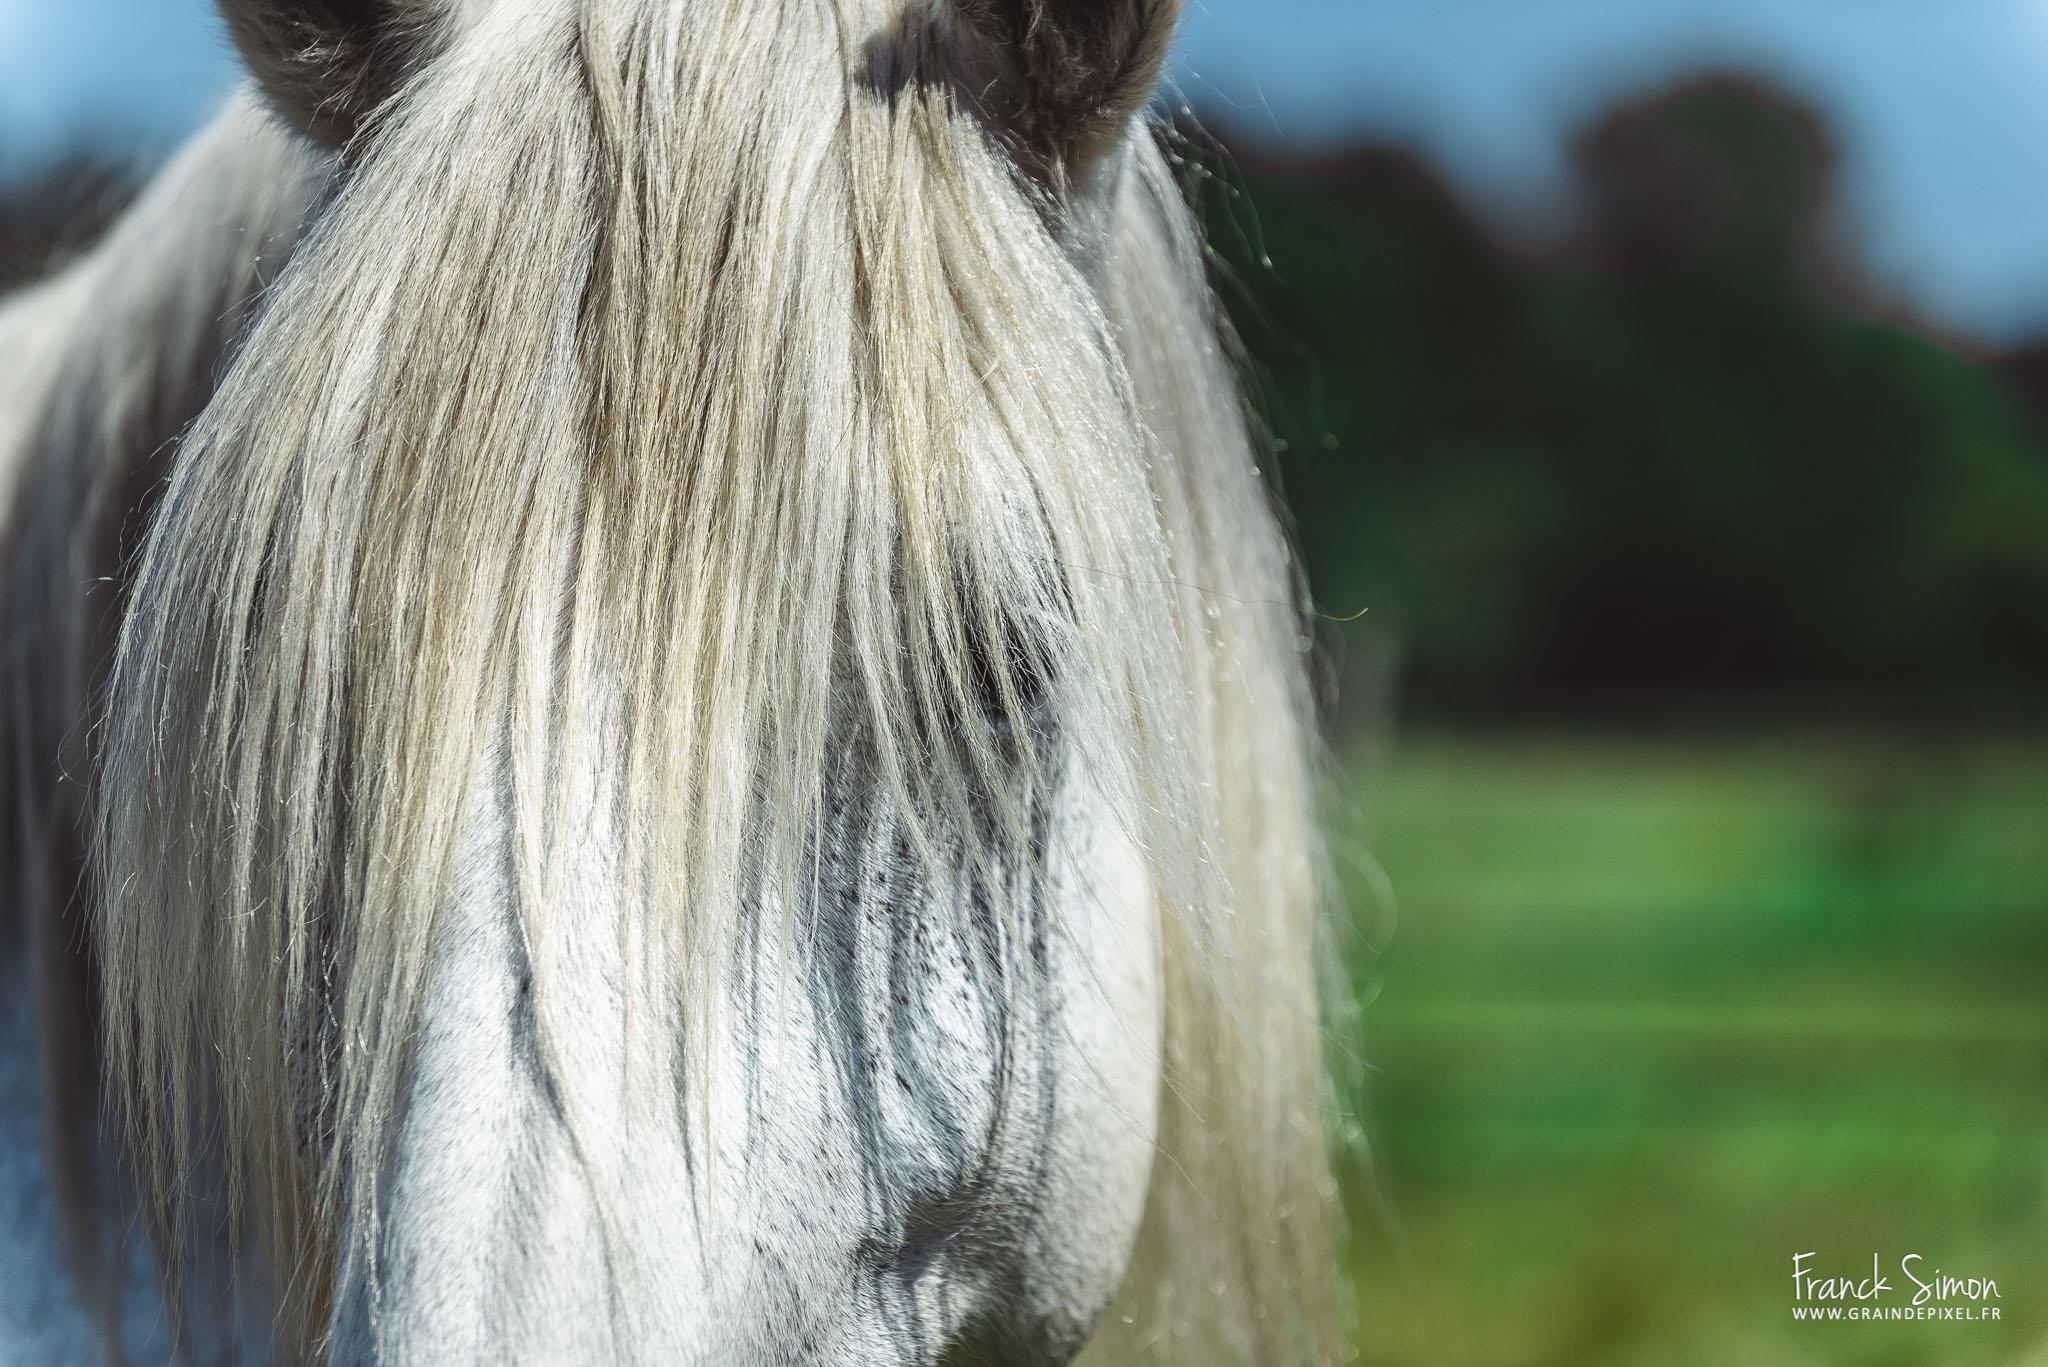 10-errerus-photographie-equestre-grain-de-pixel